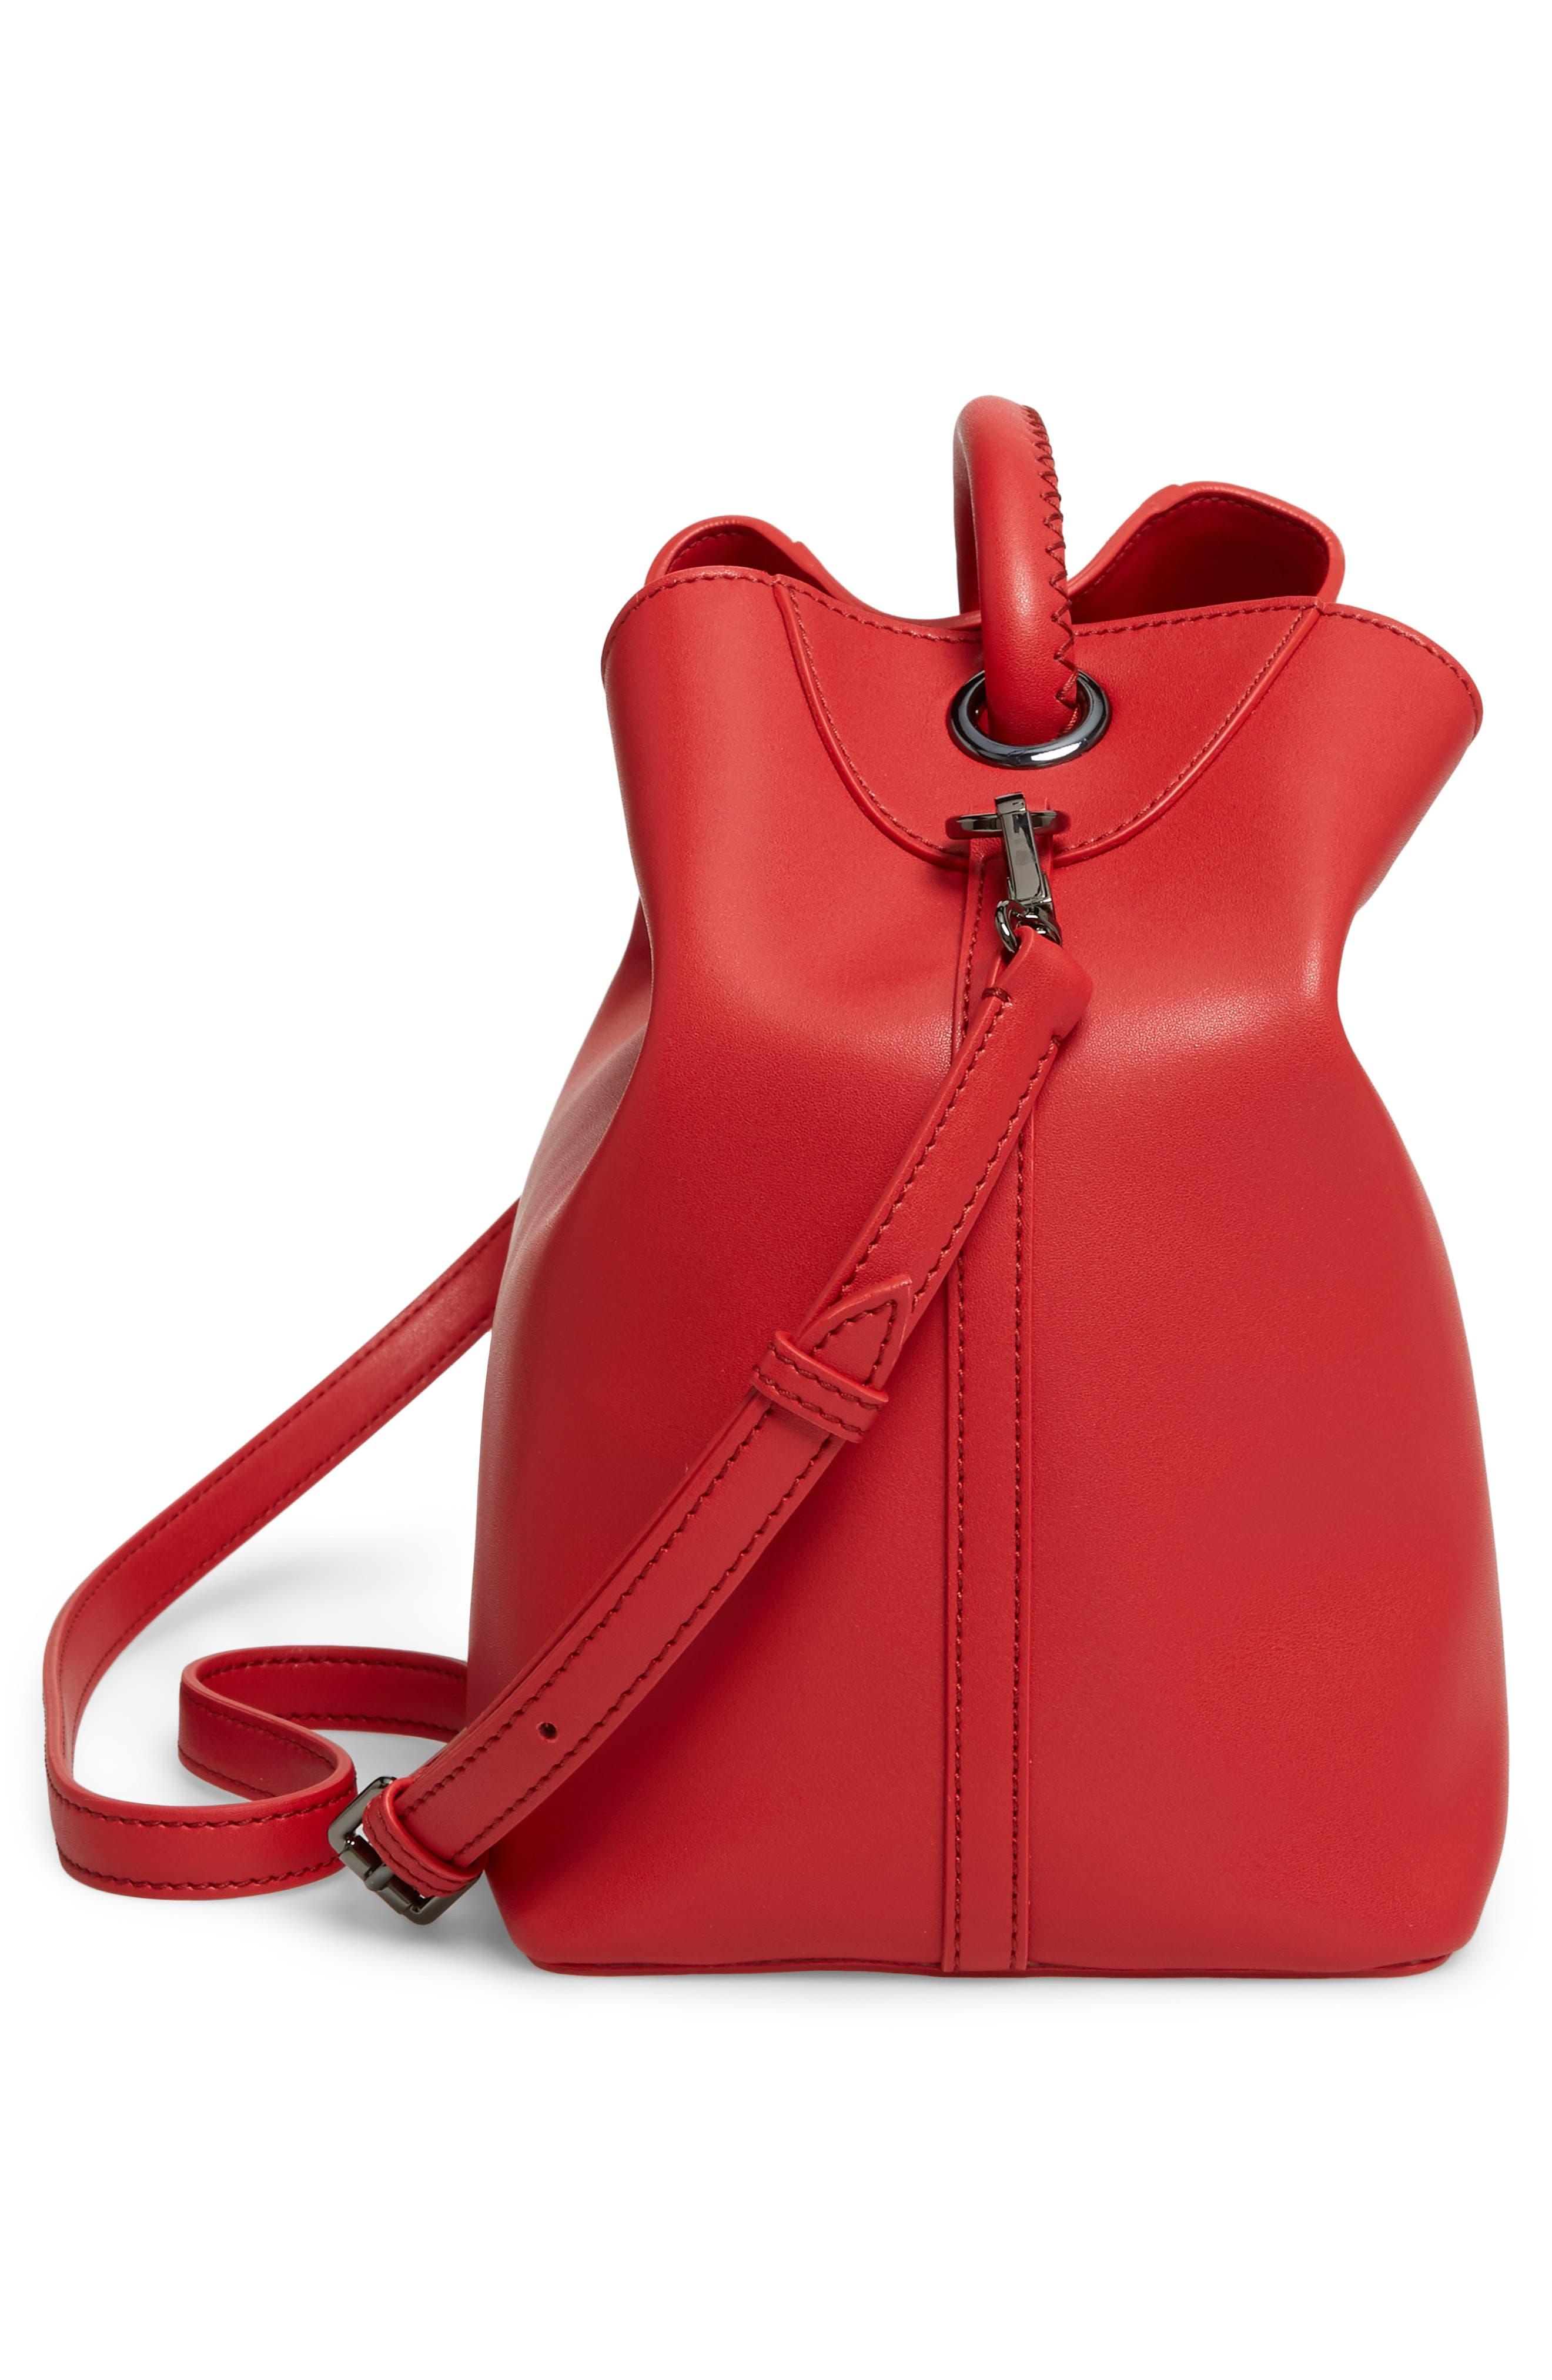 Raisin Leather Handbag,                             Alternate thumbnail 38, color,